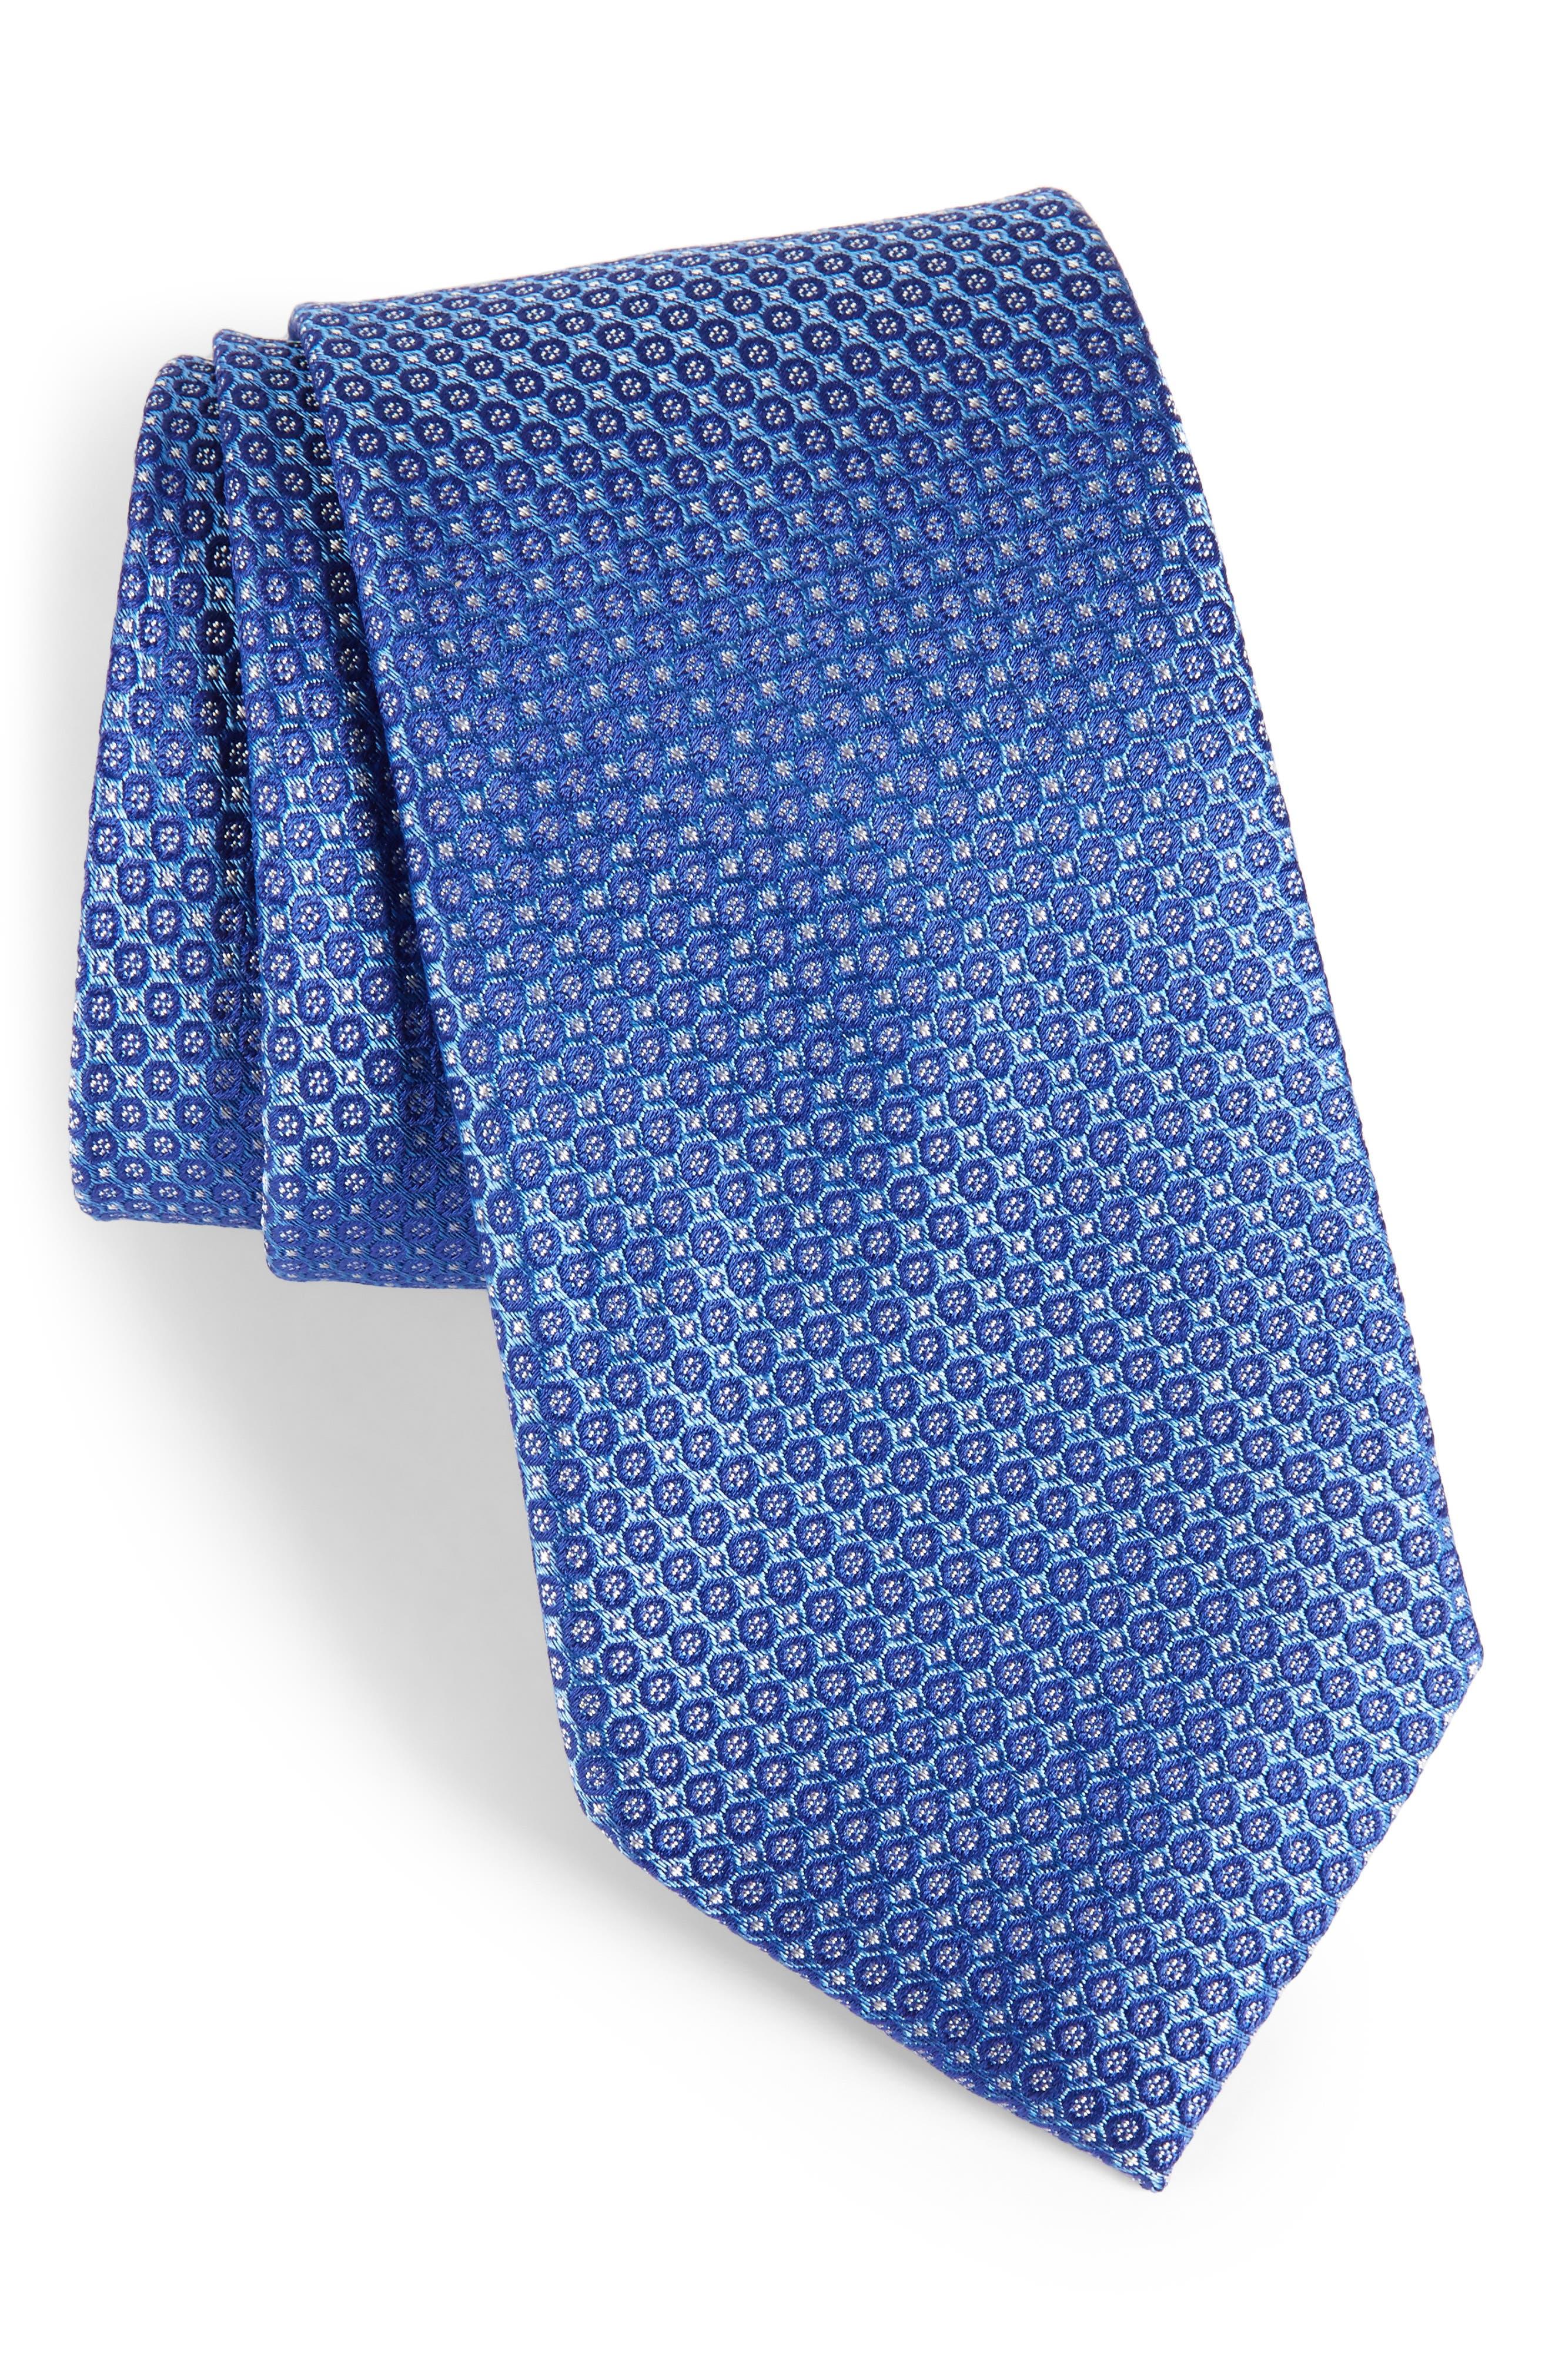 Alternate Image 1 Selected - Nordstrom Men's Shop Park Ave Solid Silk Tie